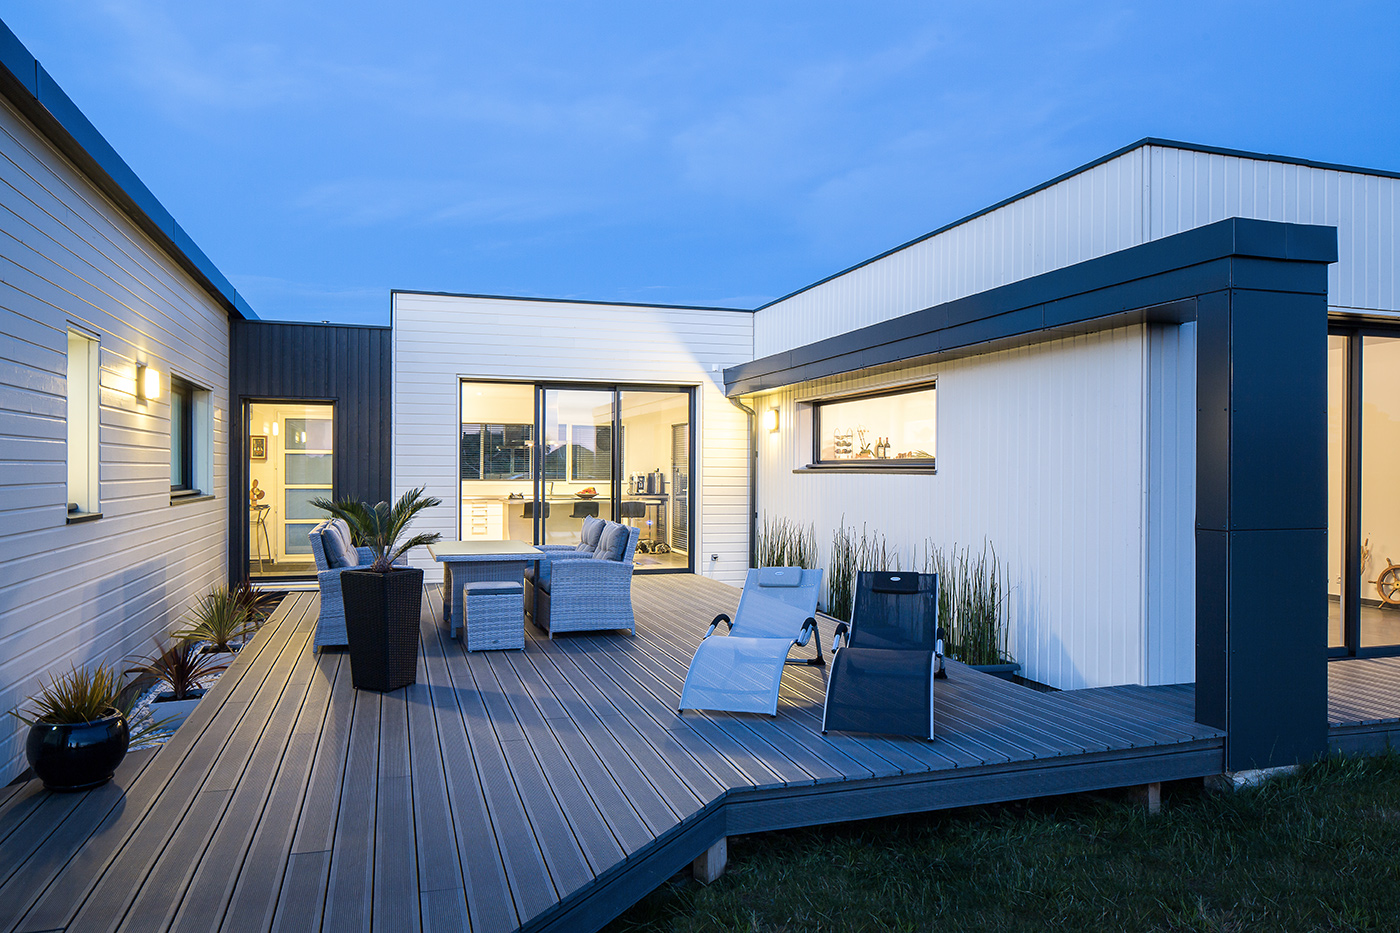 excellent maison plain pied trecobat rv93 humatraffin. Black Bedroom Furniture Sets. Home Design Ideas